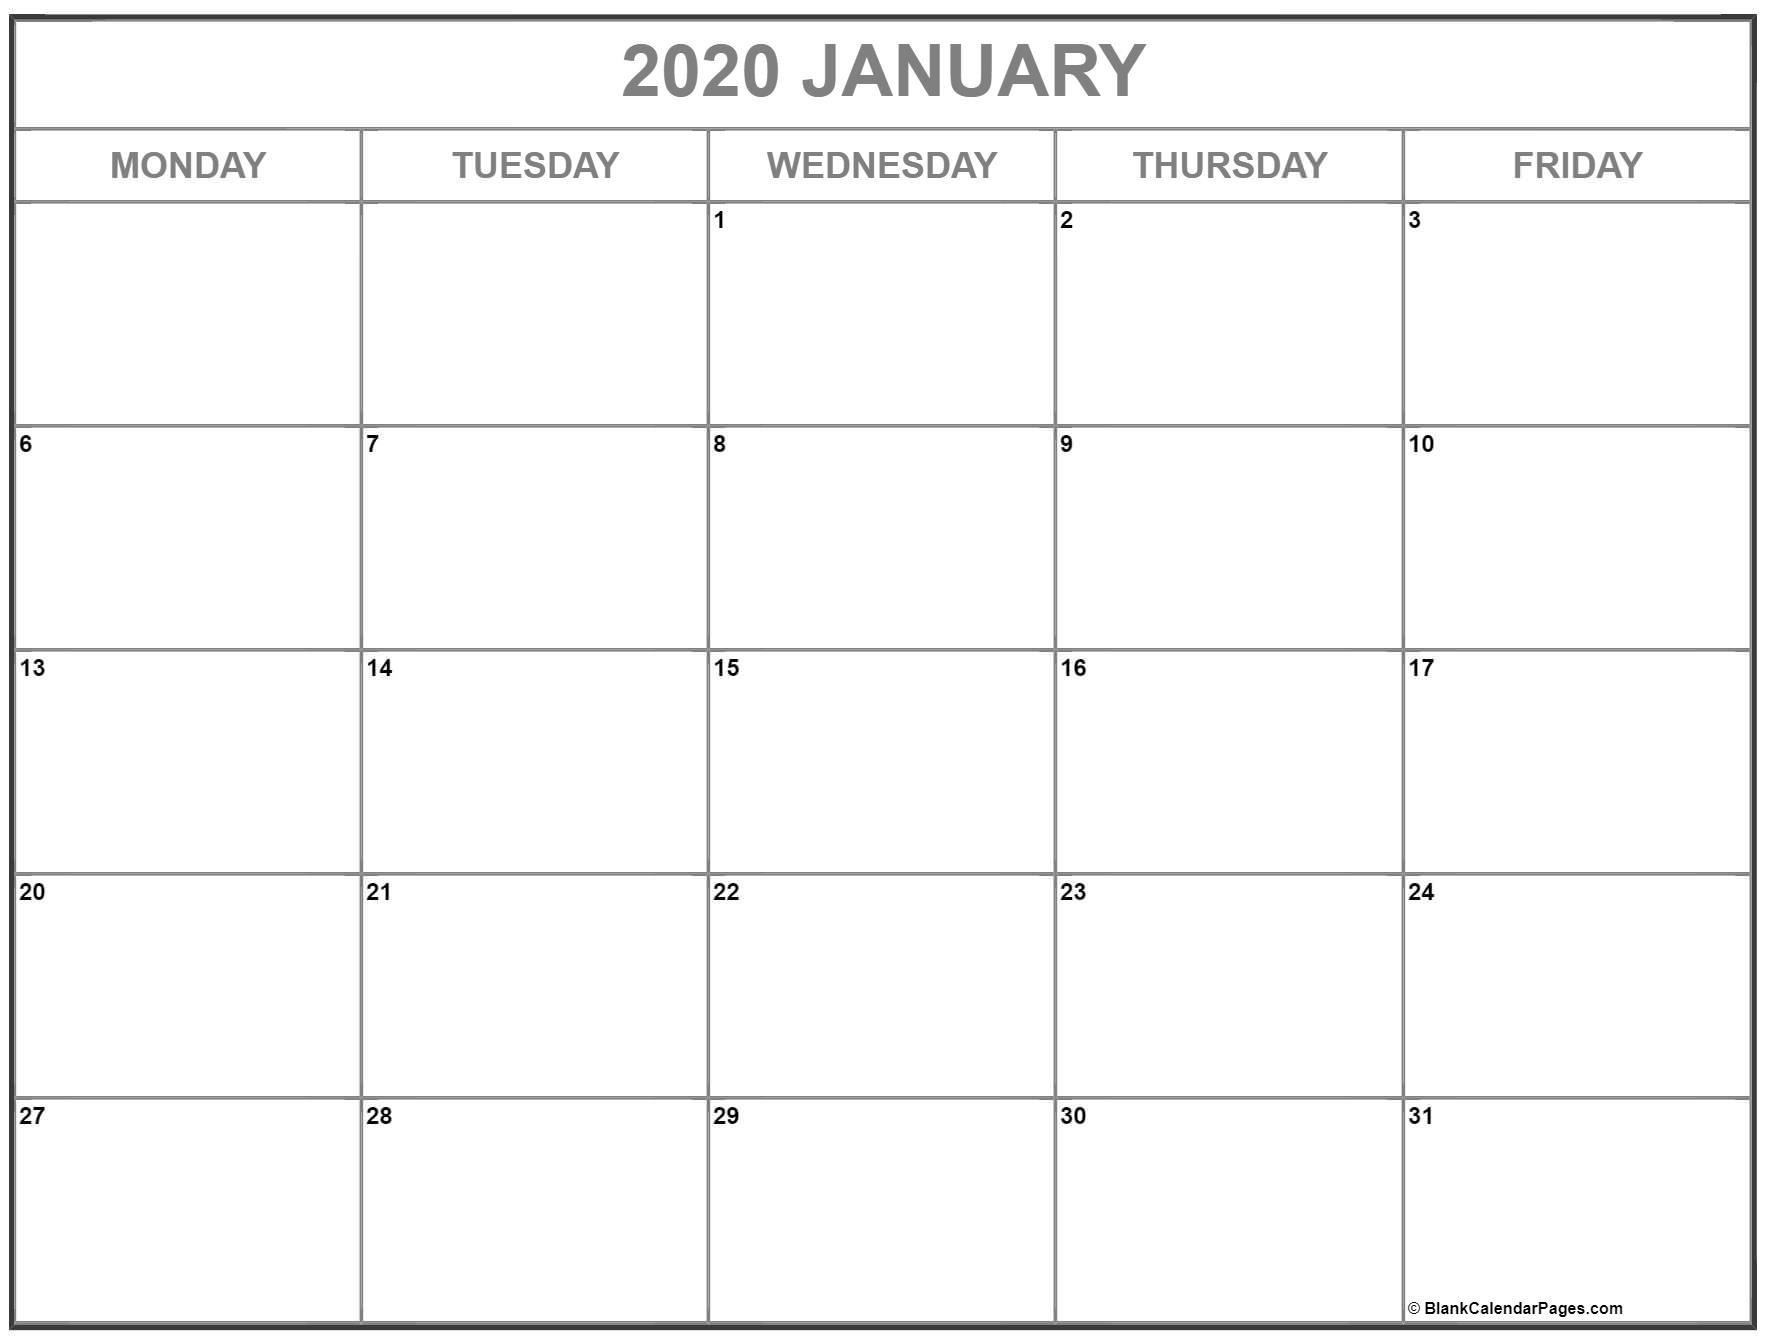 January 2020 Monday Calendar | Monday To Sunday  Monday To Sunday Calendar Template